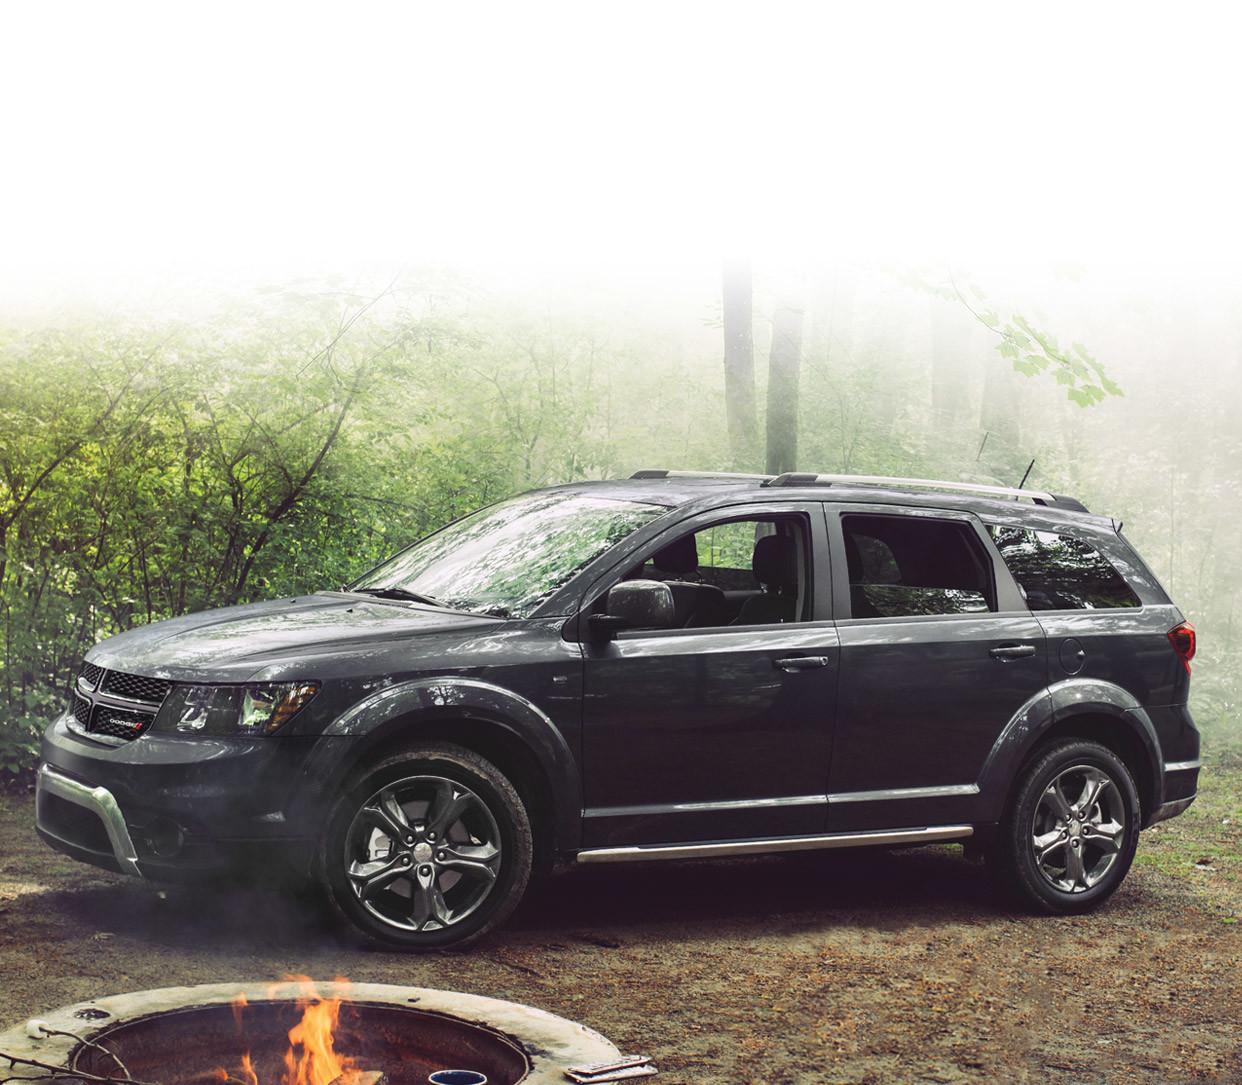 2018 Dodge Journey Crossover SUV